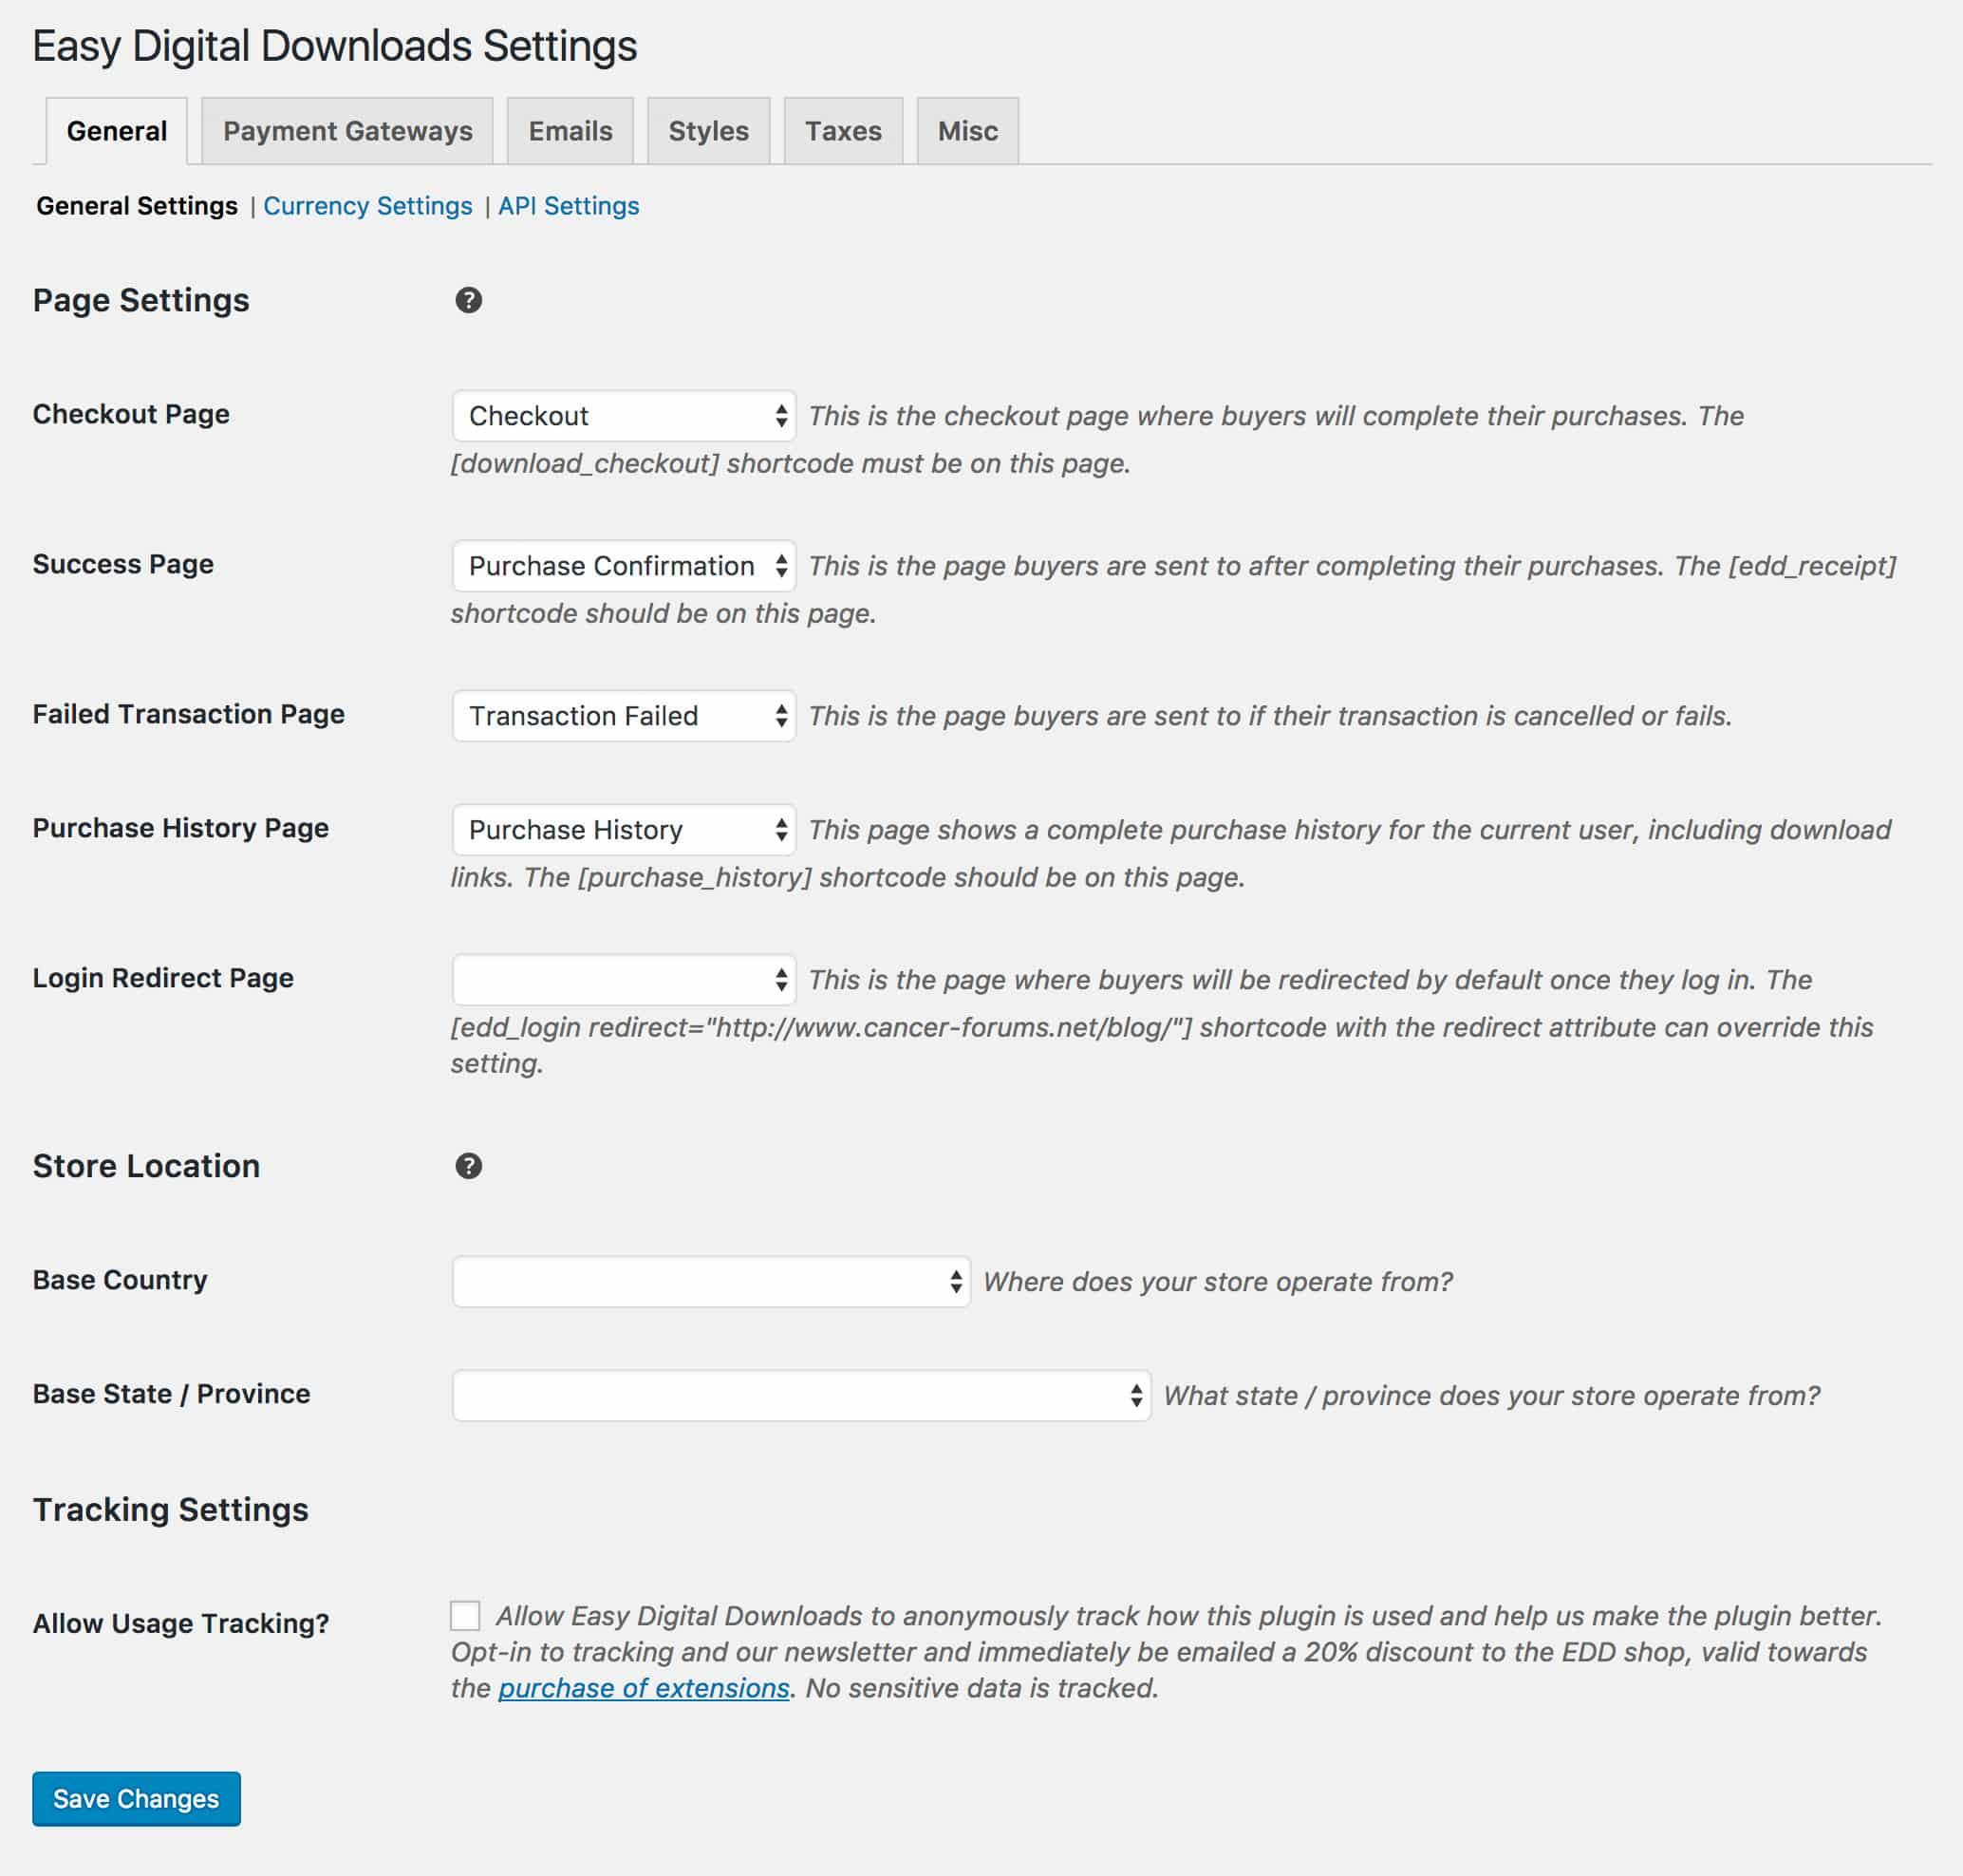 Easy Digital Downloads General Settings